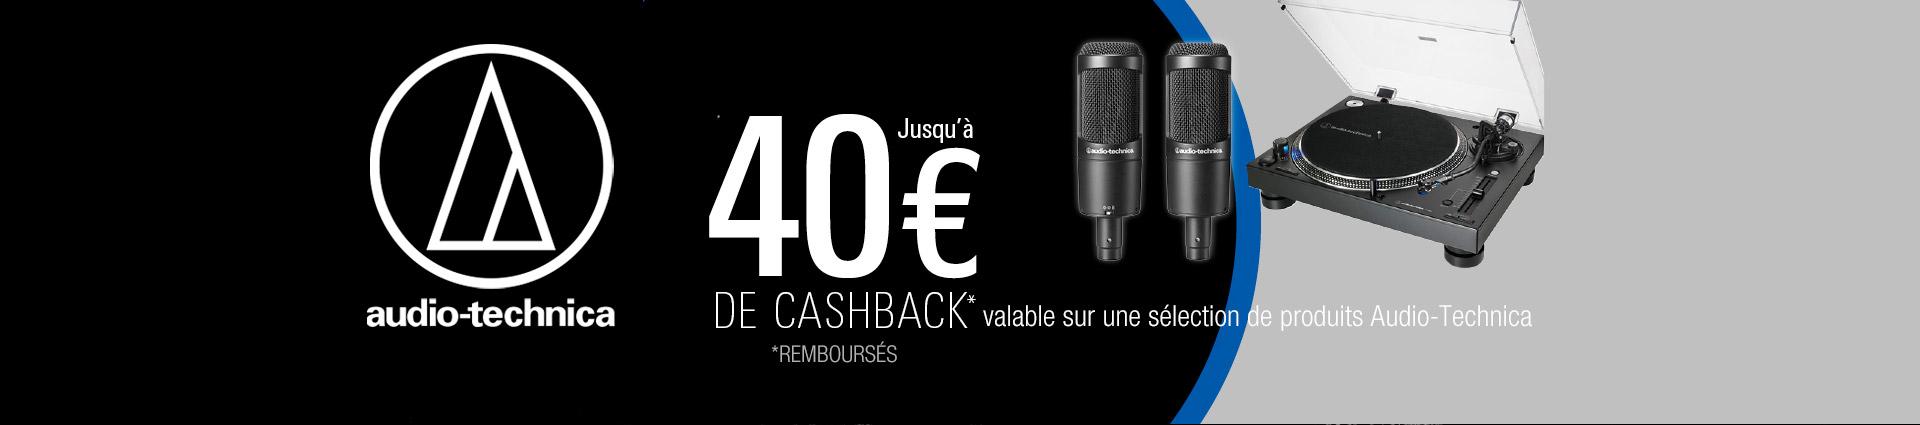 Cashback Audio Technica